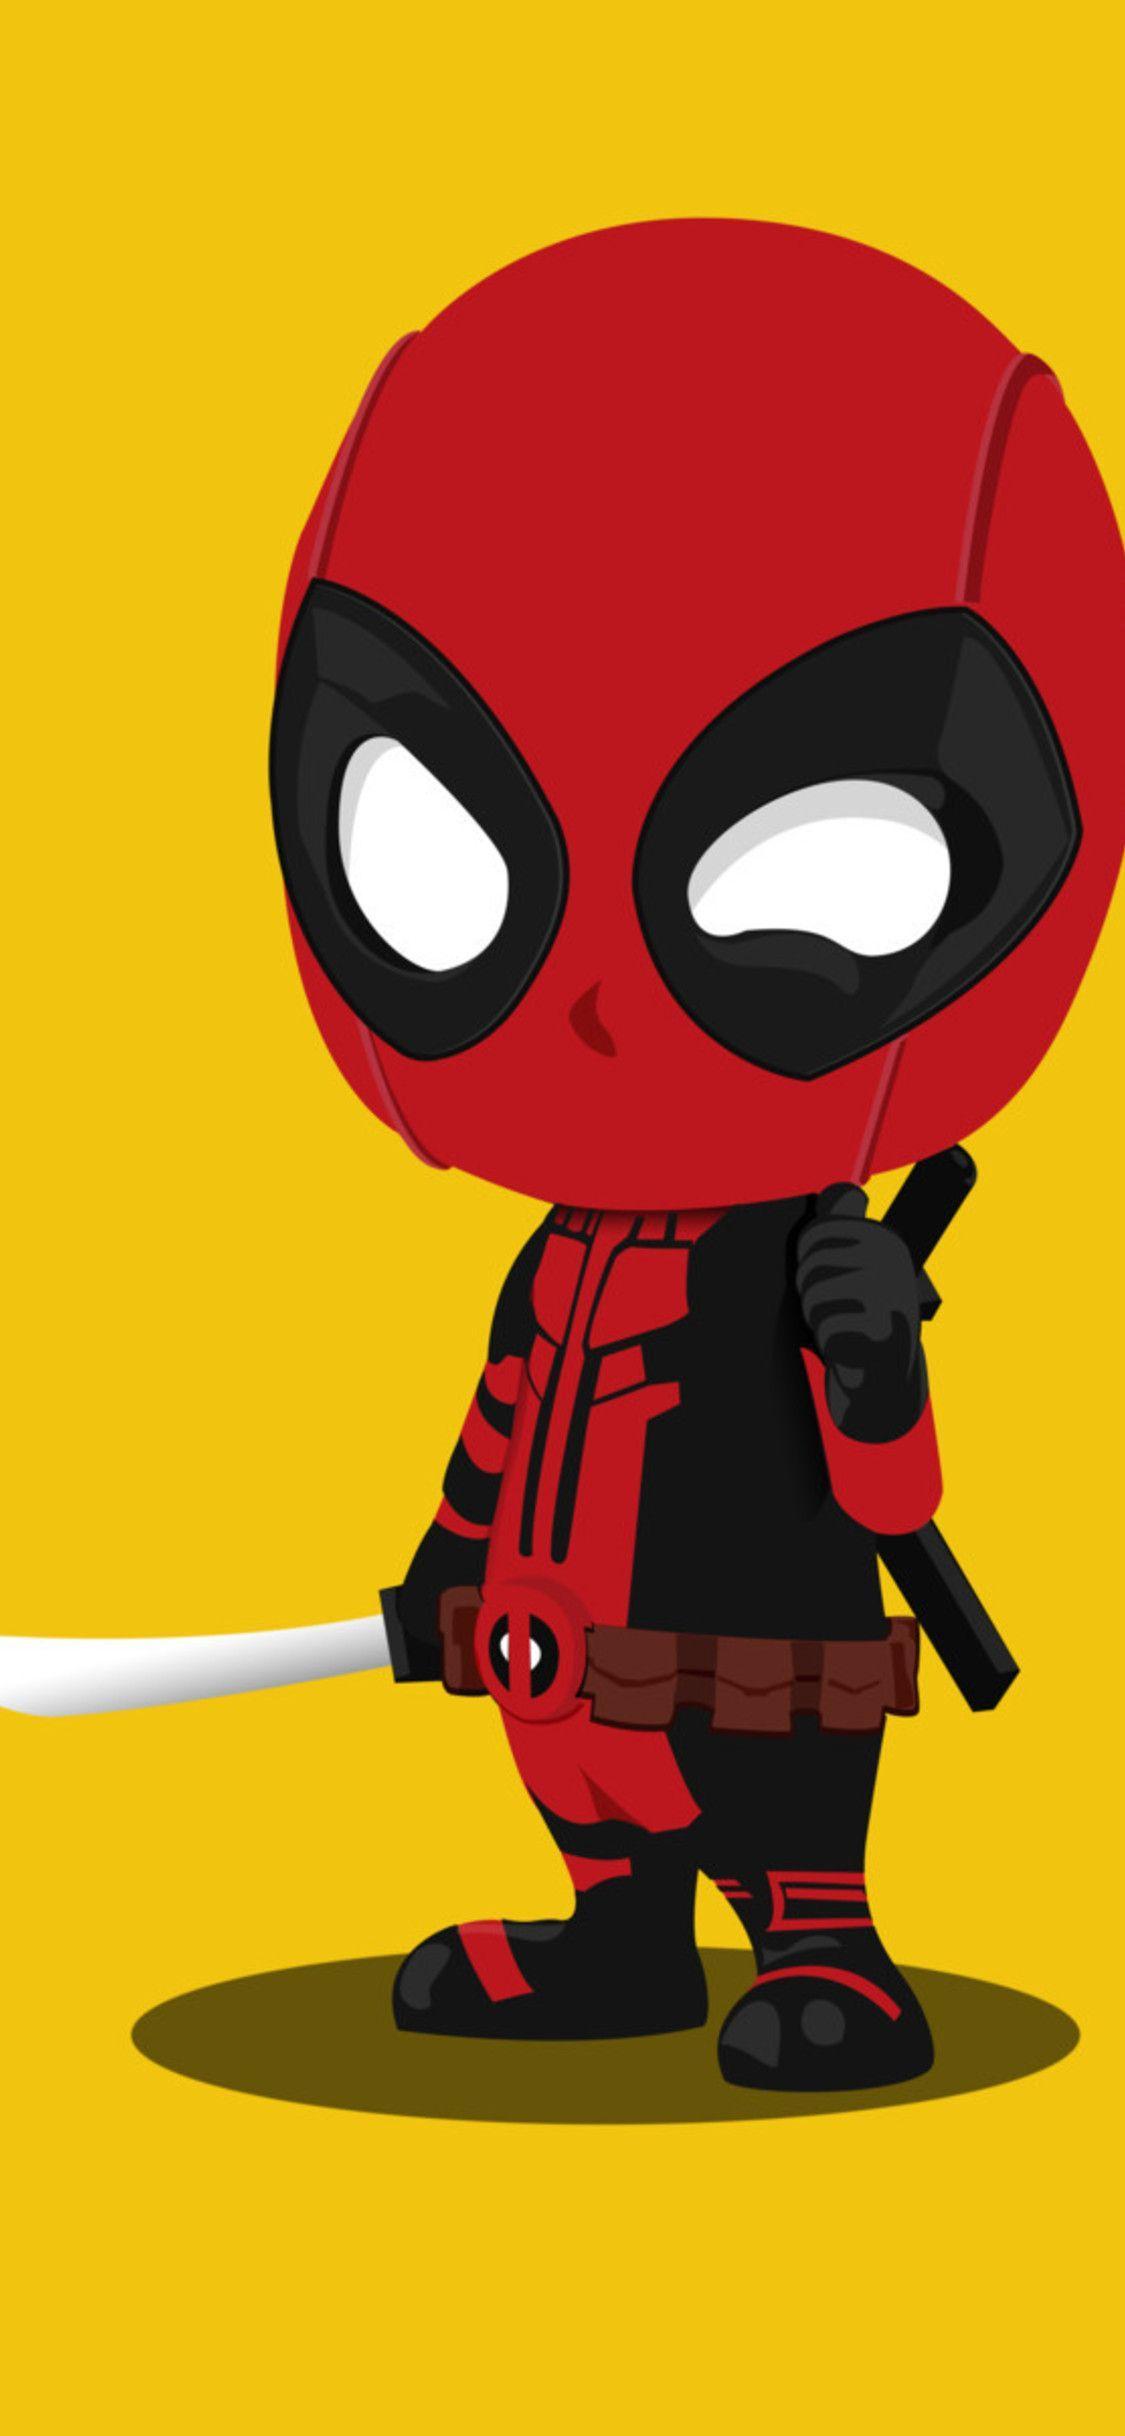 Cartoon Deadpool Iphone Wallpapers Top Free Cartoon